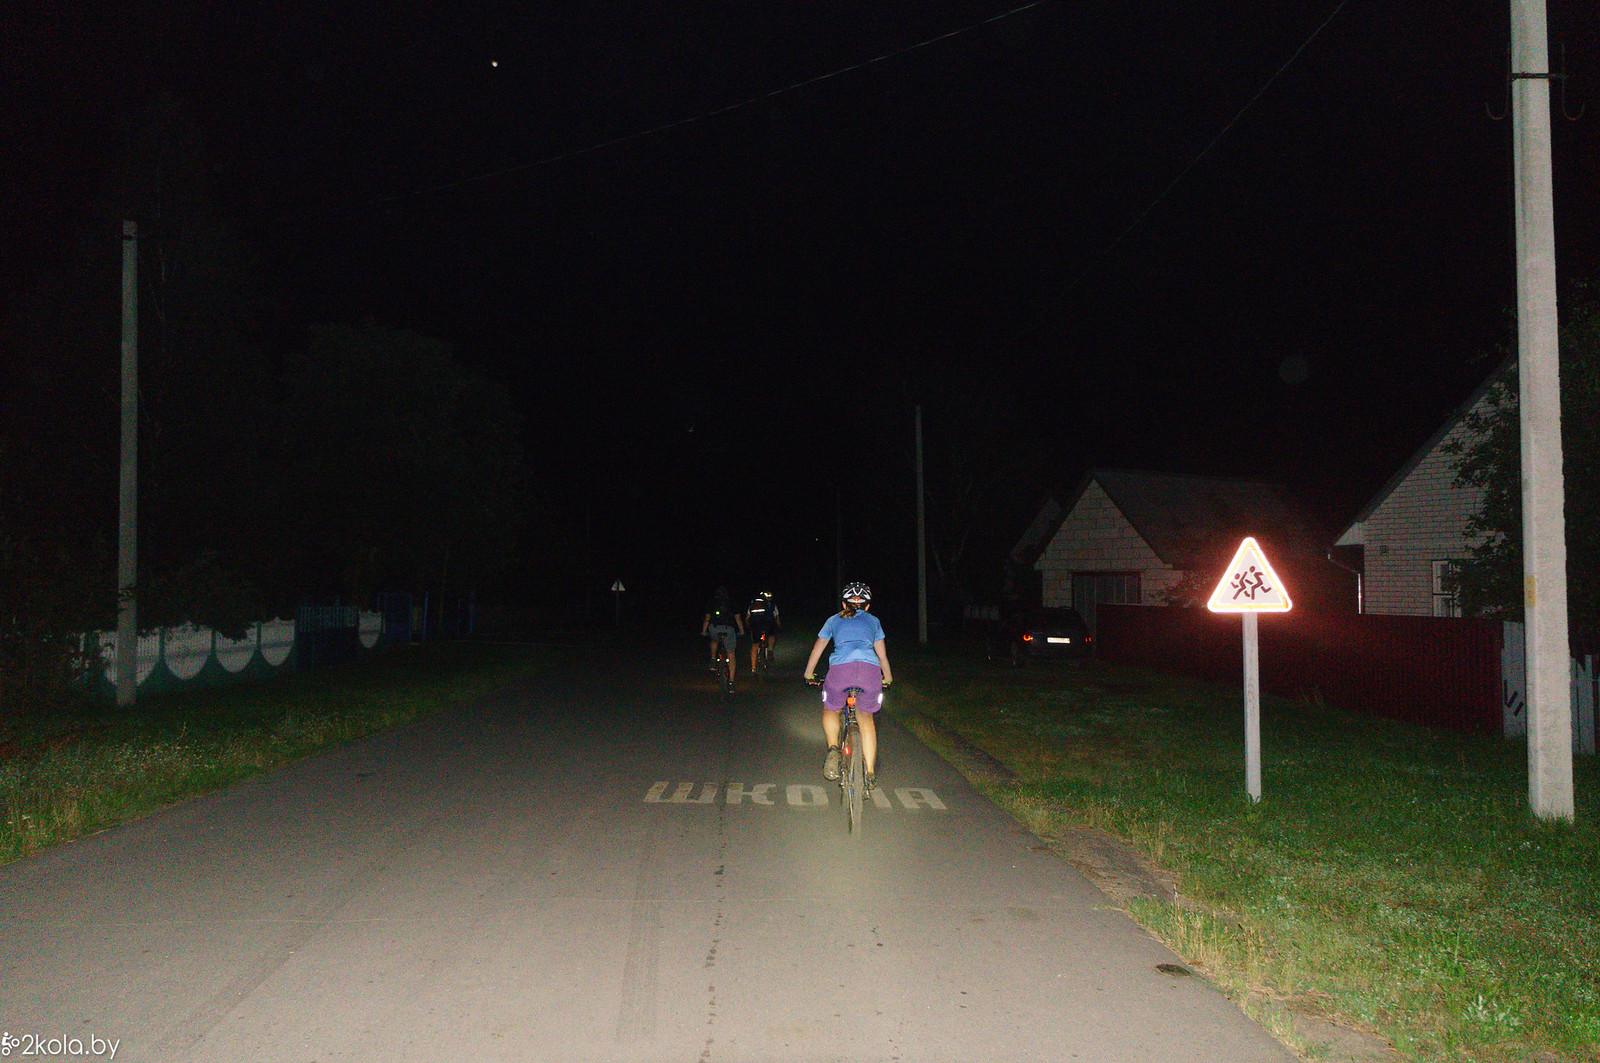 35562171784 c1d9aec804 h - Ночная велопокатушка 2017 (Тимковичи - Люща)